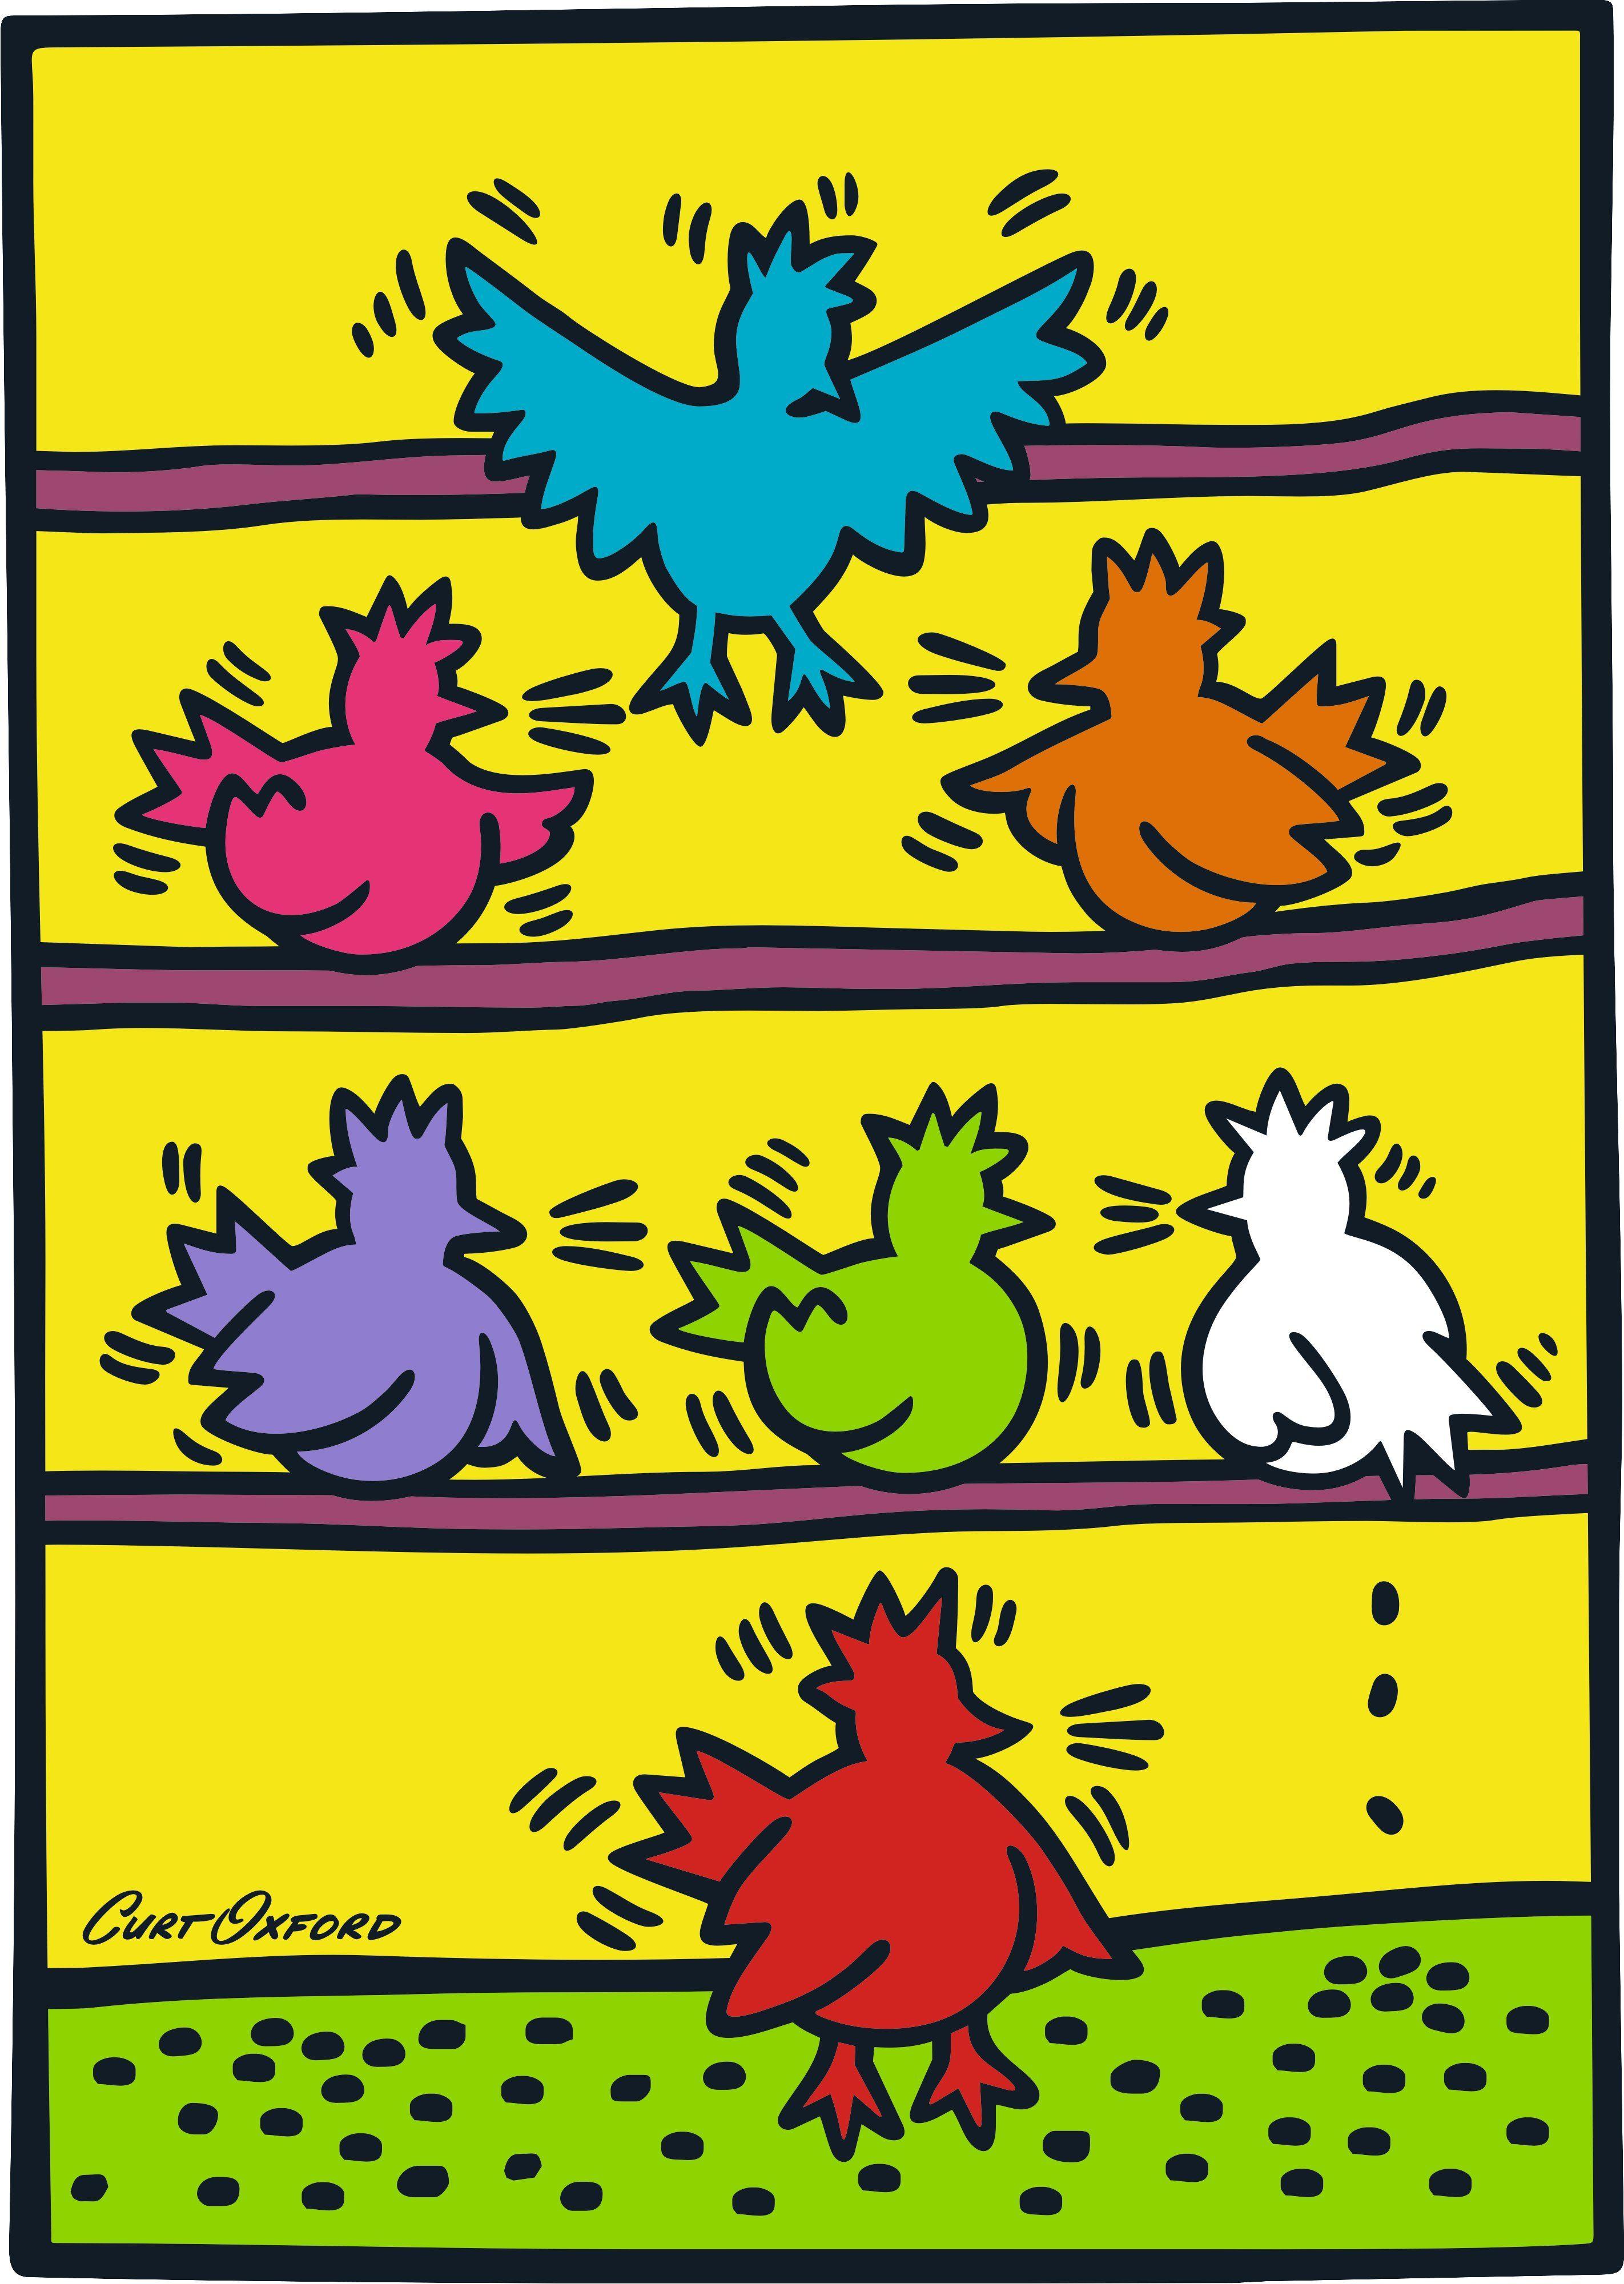 Roosting Chickens b7dfe1c3c